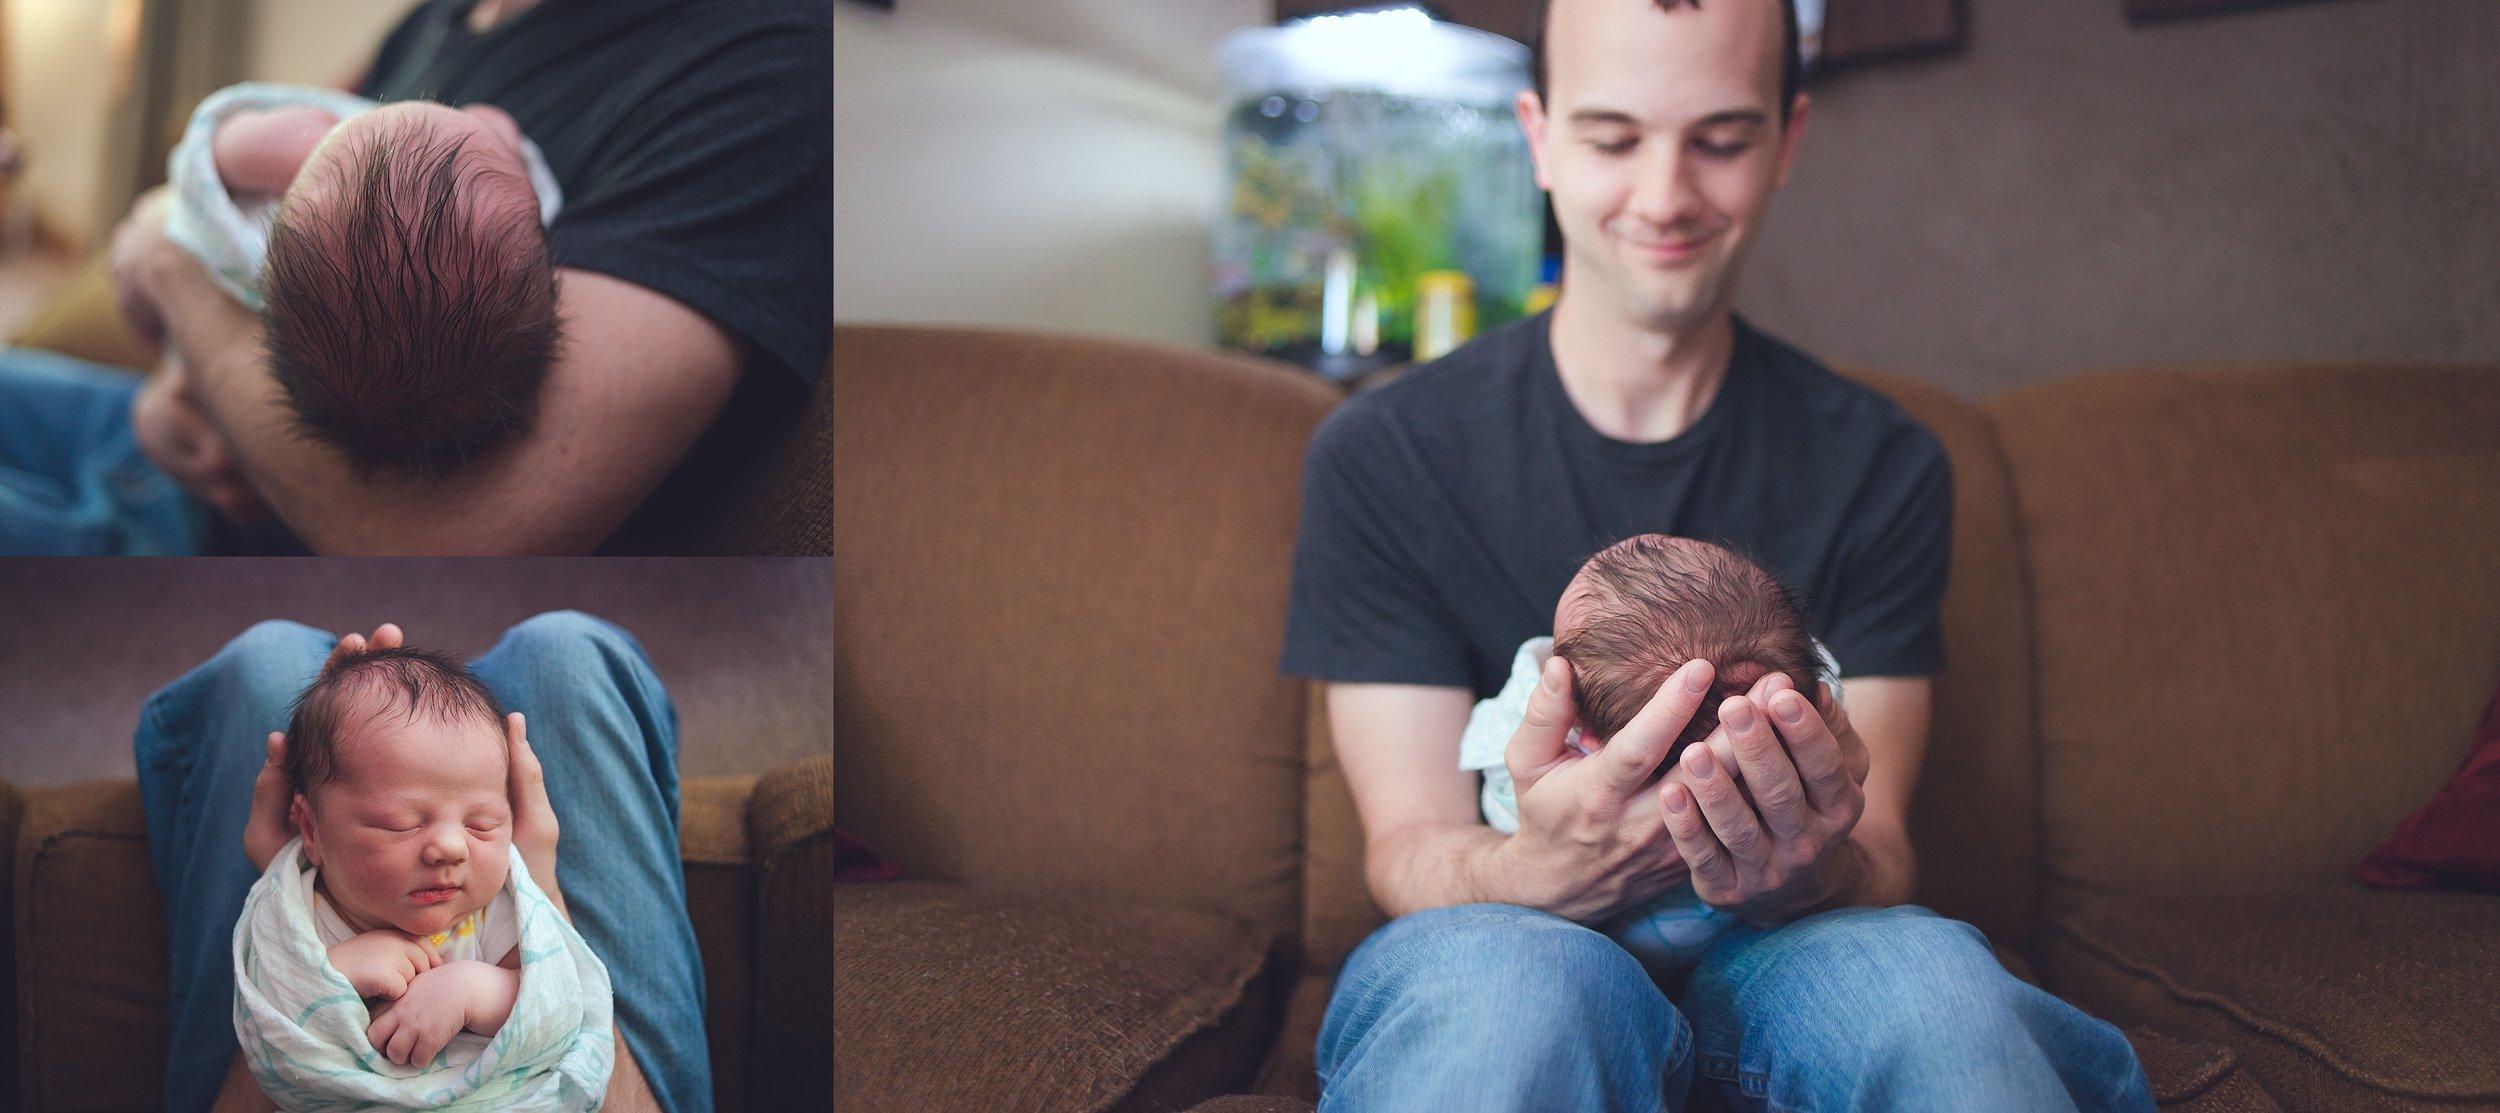 BrittneyHogue-NewbornPhotographer-FamilyPhotographer-PeoriaIL-PekinIL-MortonIL (4).jpg